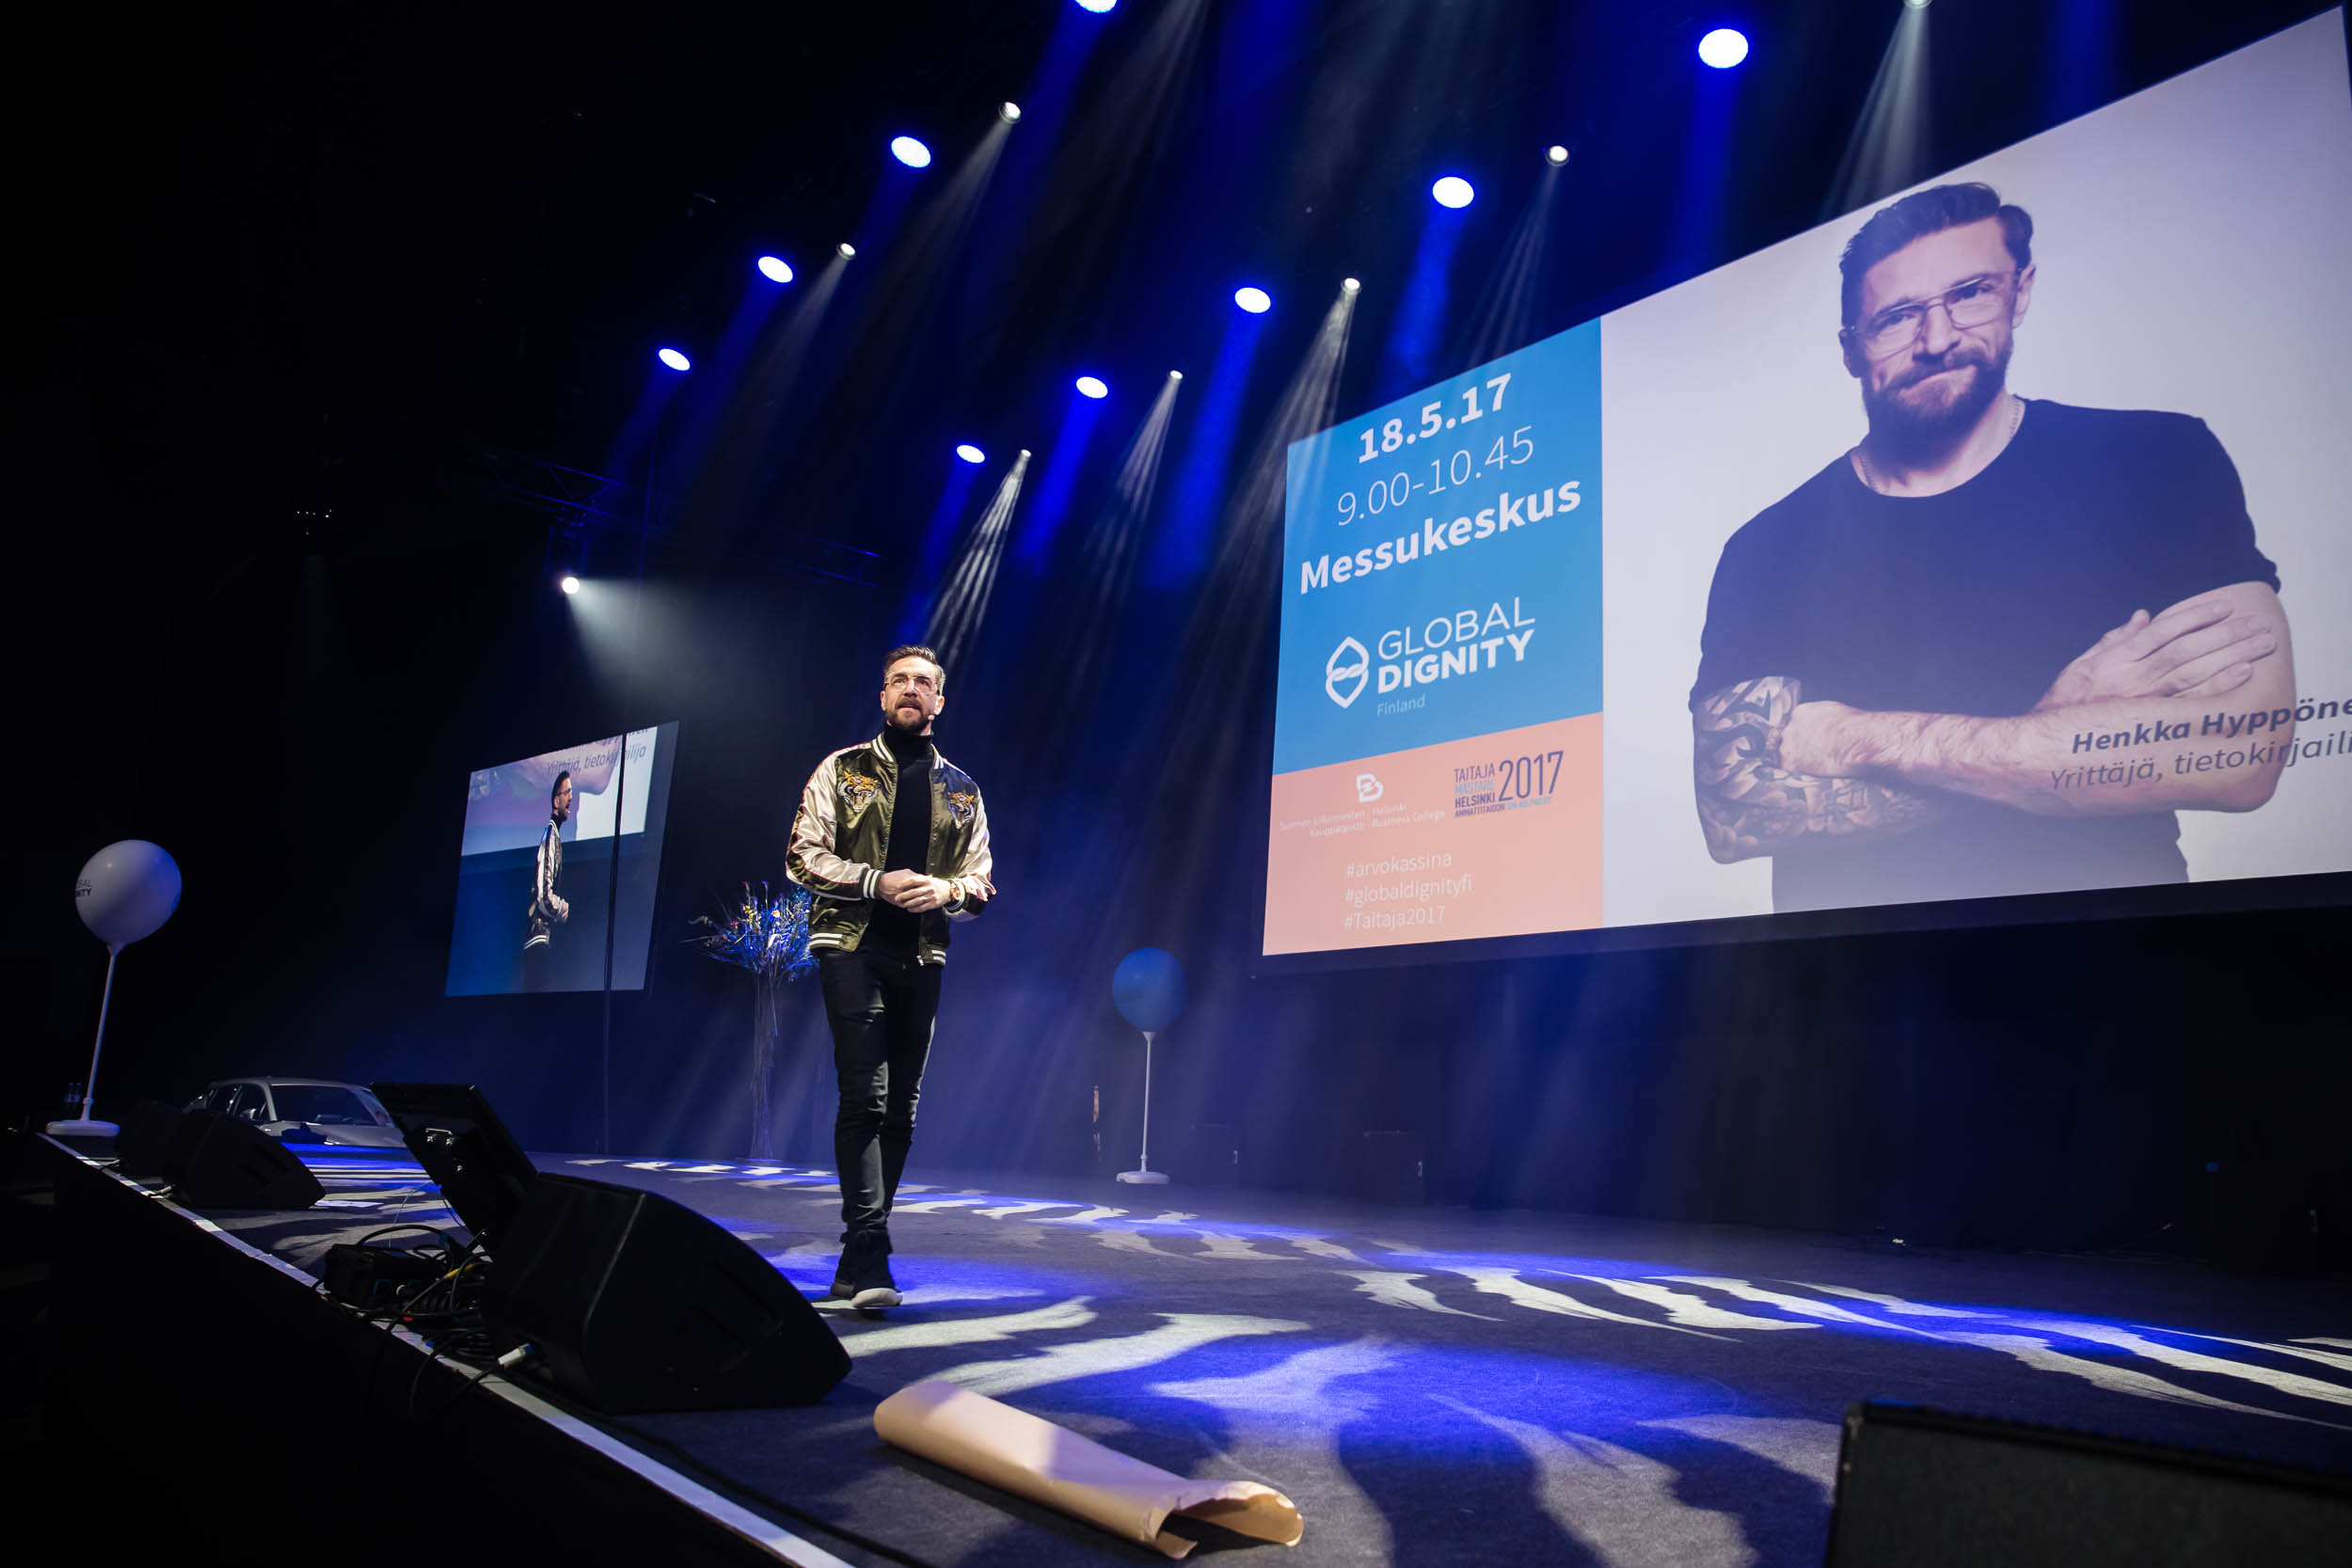 Global Dignity | Taitaja Helsinki 2017